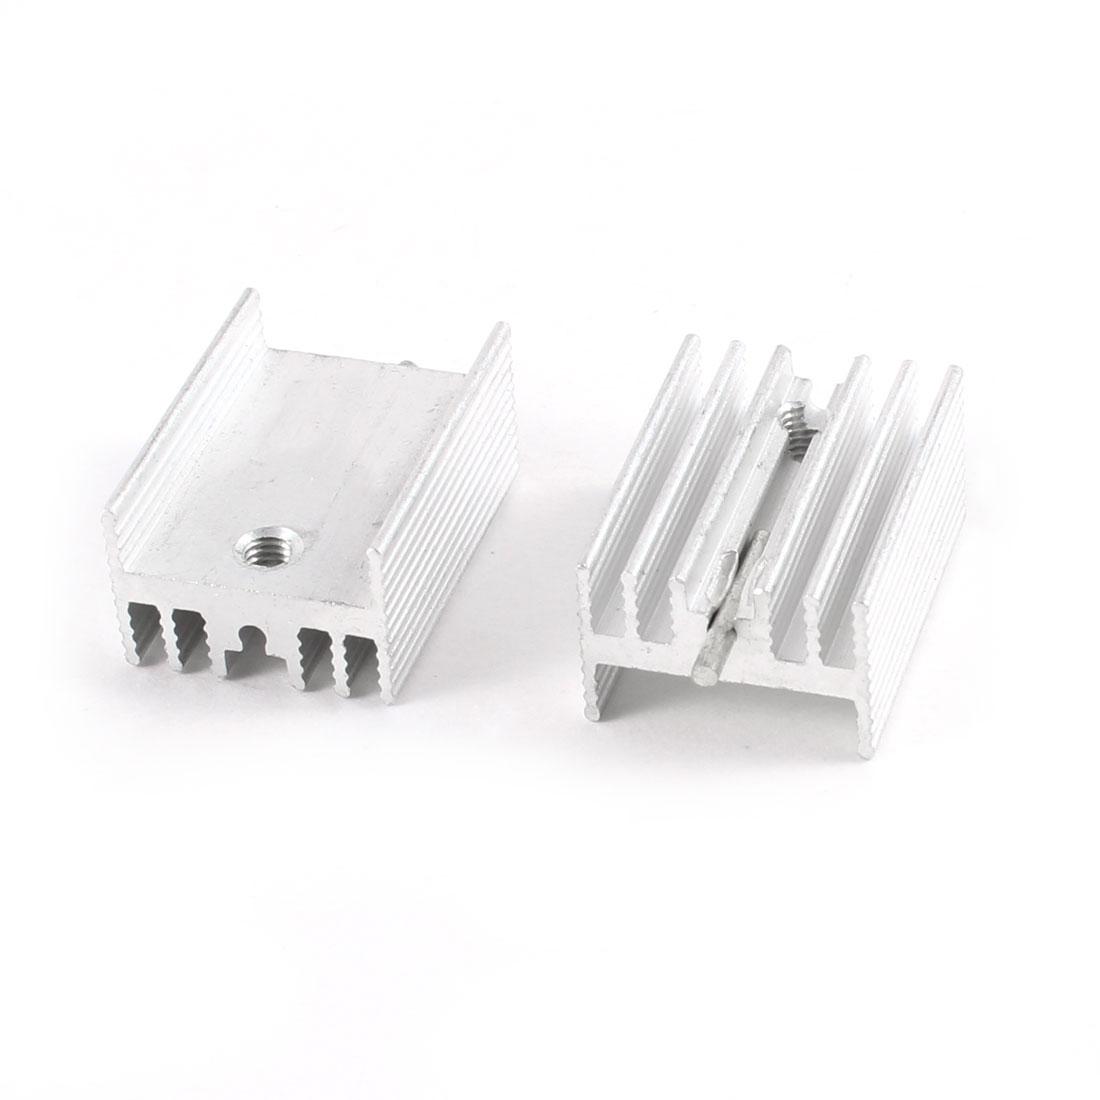 2 Pcs 21mm x 15mm x 10mm Aluminium Heatsink Radiating Cooler Cooling Fin